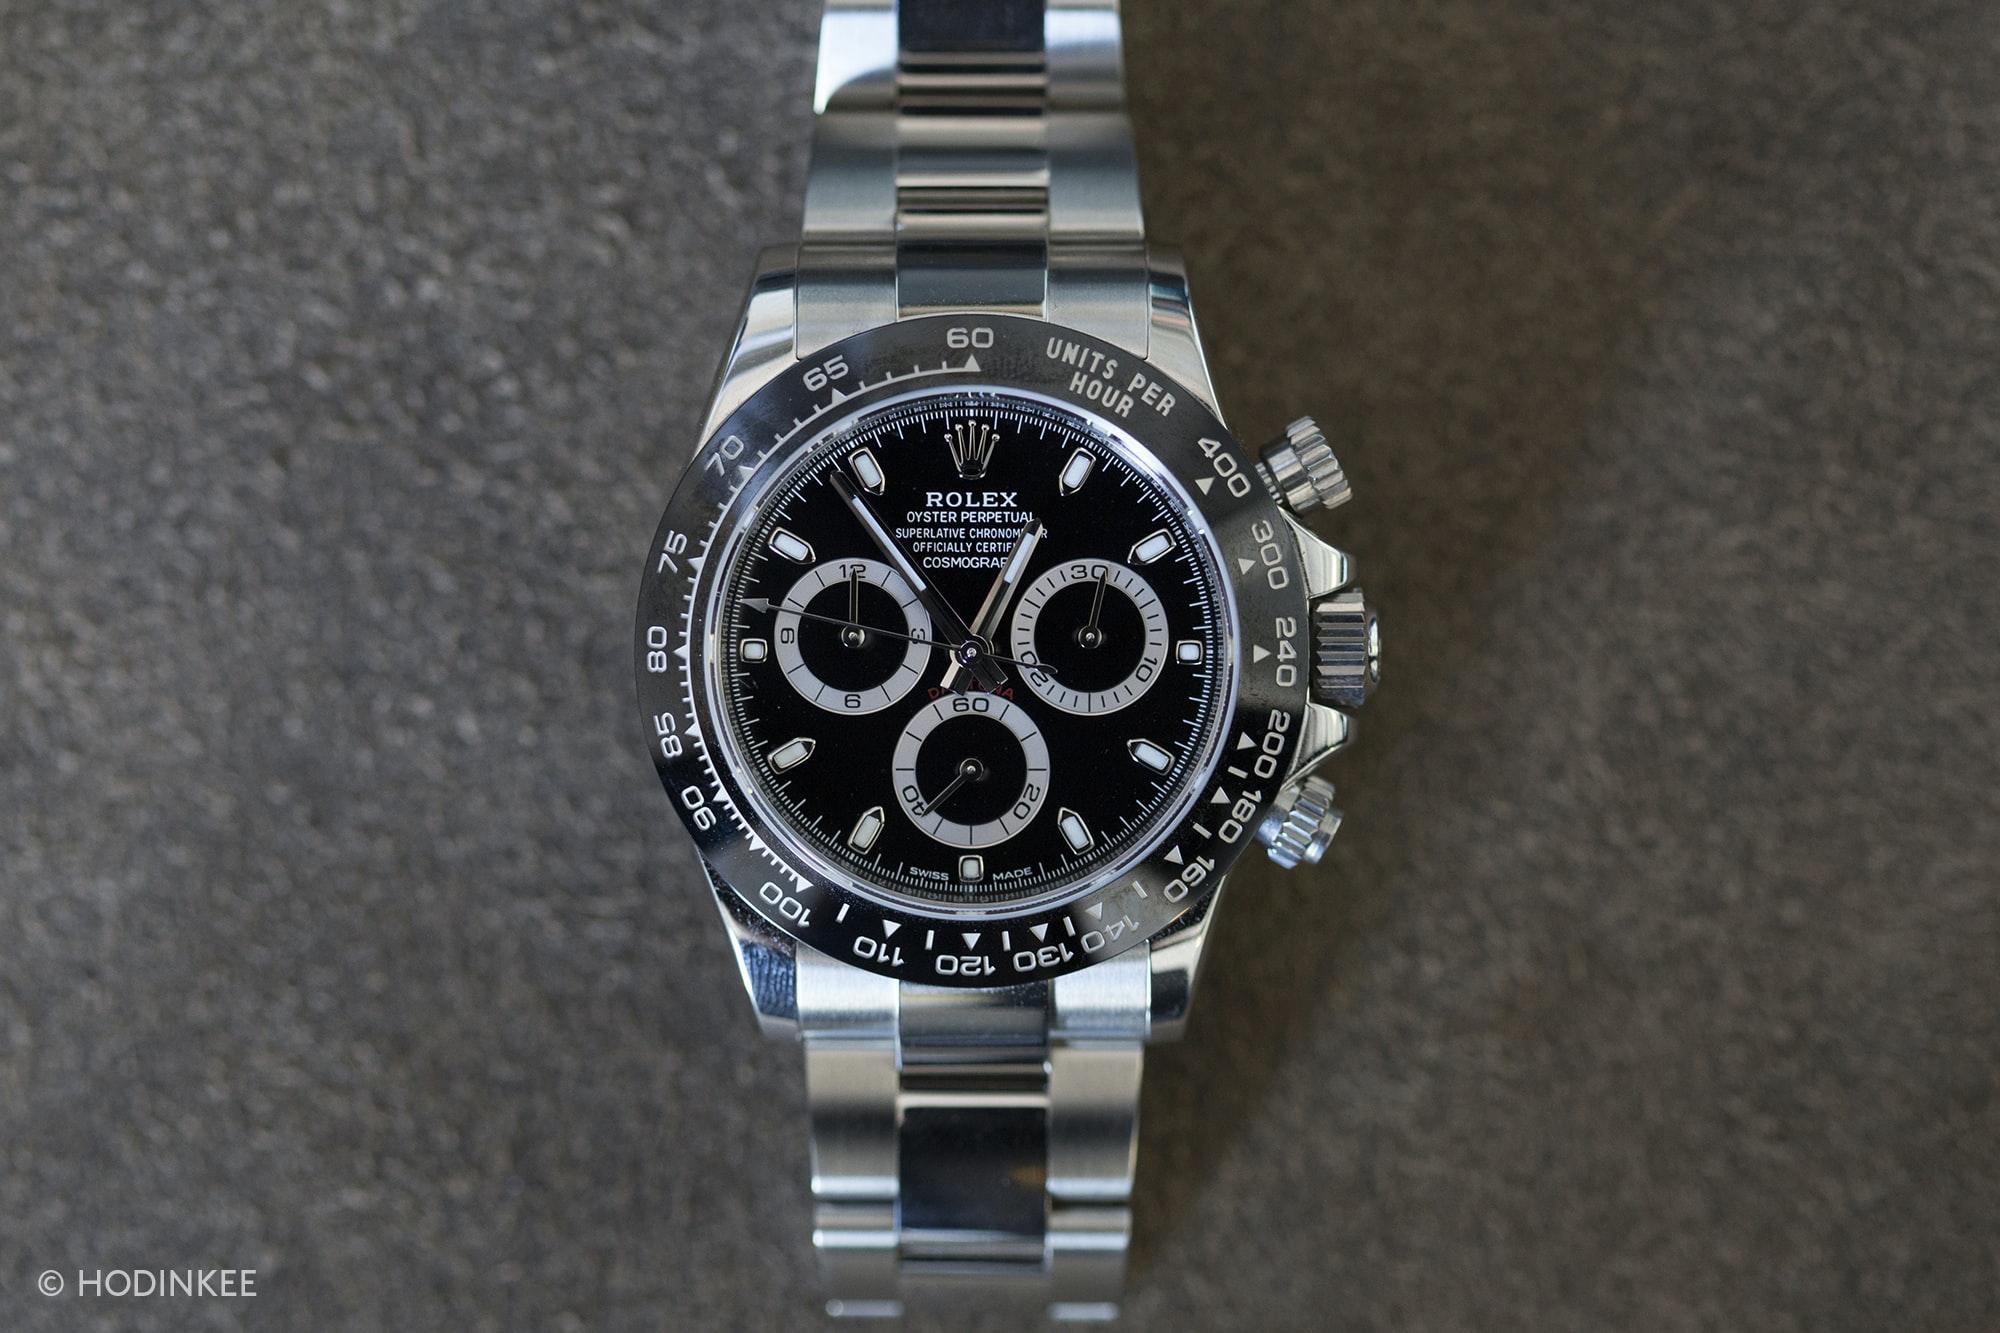 Spike Feresten Rolex Daytona Talking Watches: With Spike Feresten Talking Watches: With Spike Feresten 20013705 copy